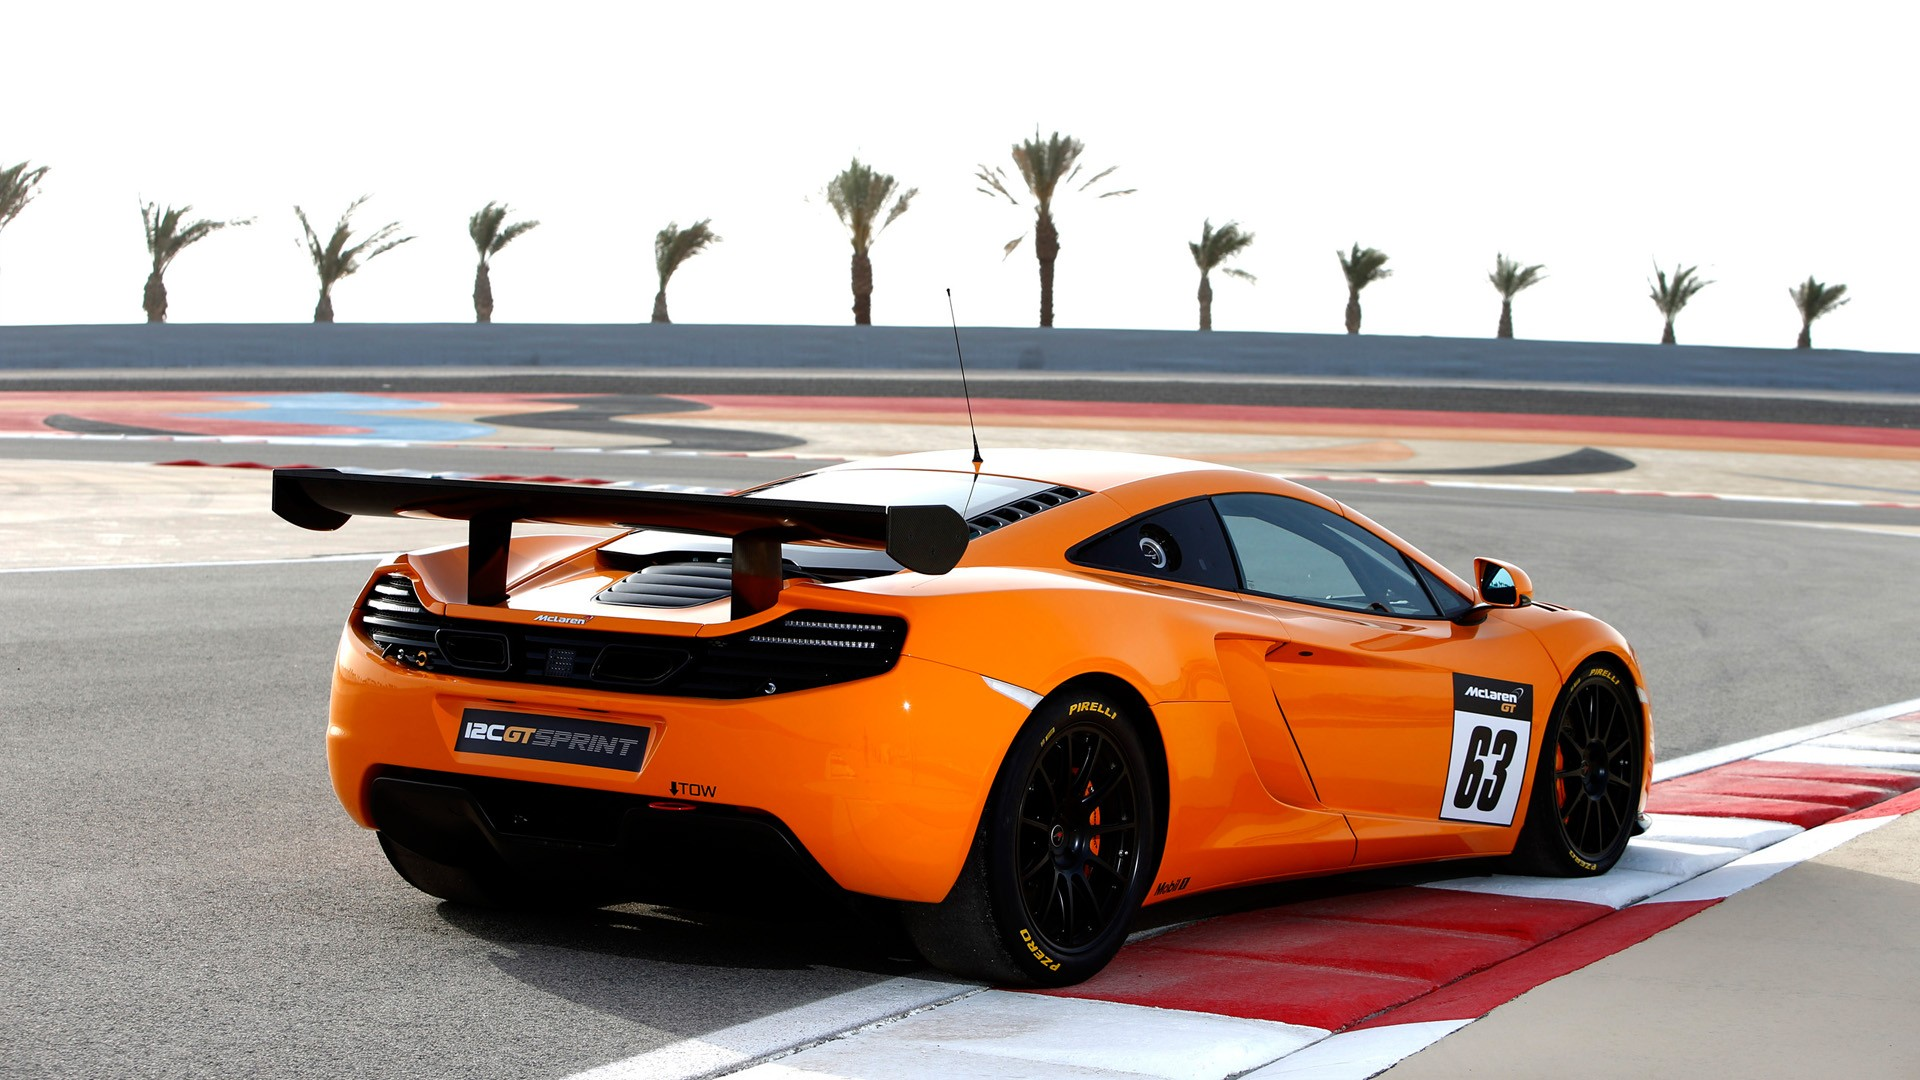 2013 McLaren 12C GT Sprint 2 Wallpaper   HD Car Wallpapers ...